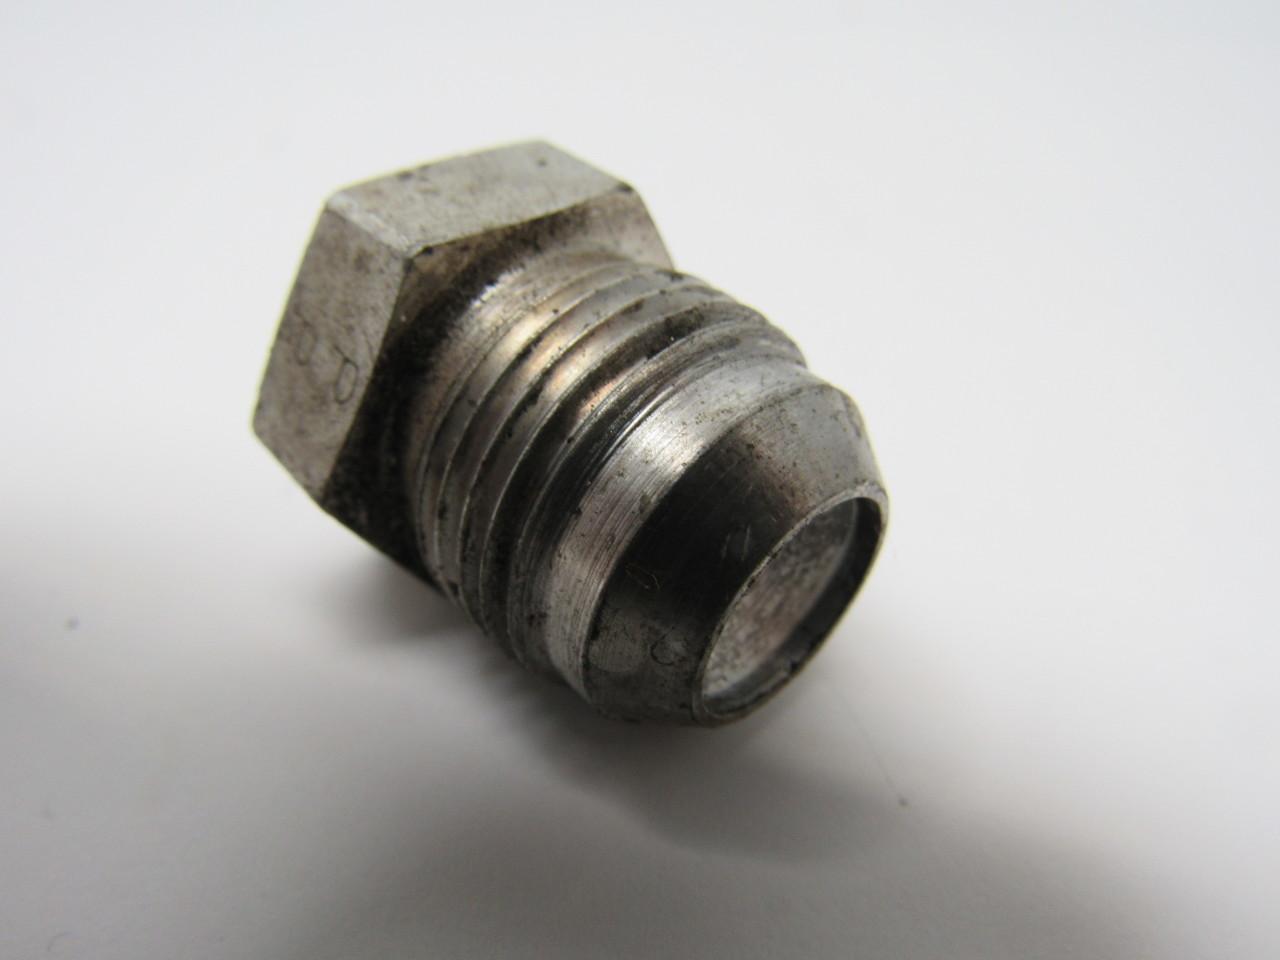 Steel hydraulic hex plug fitting ° flare for